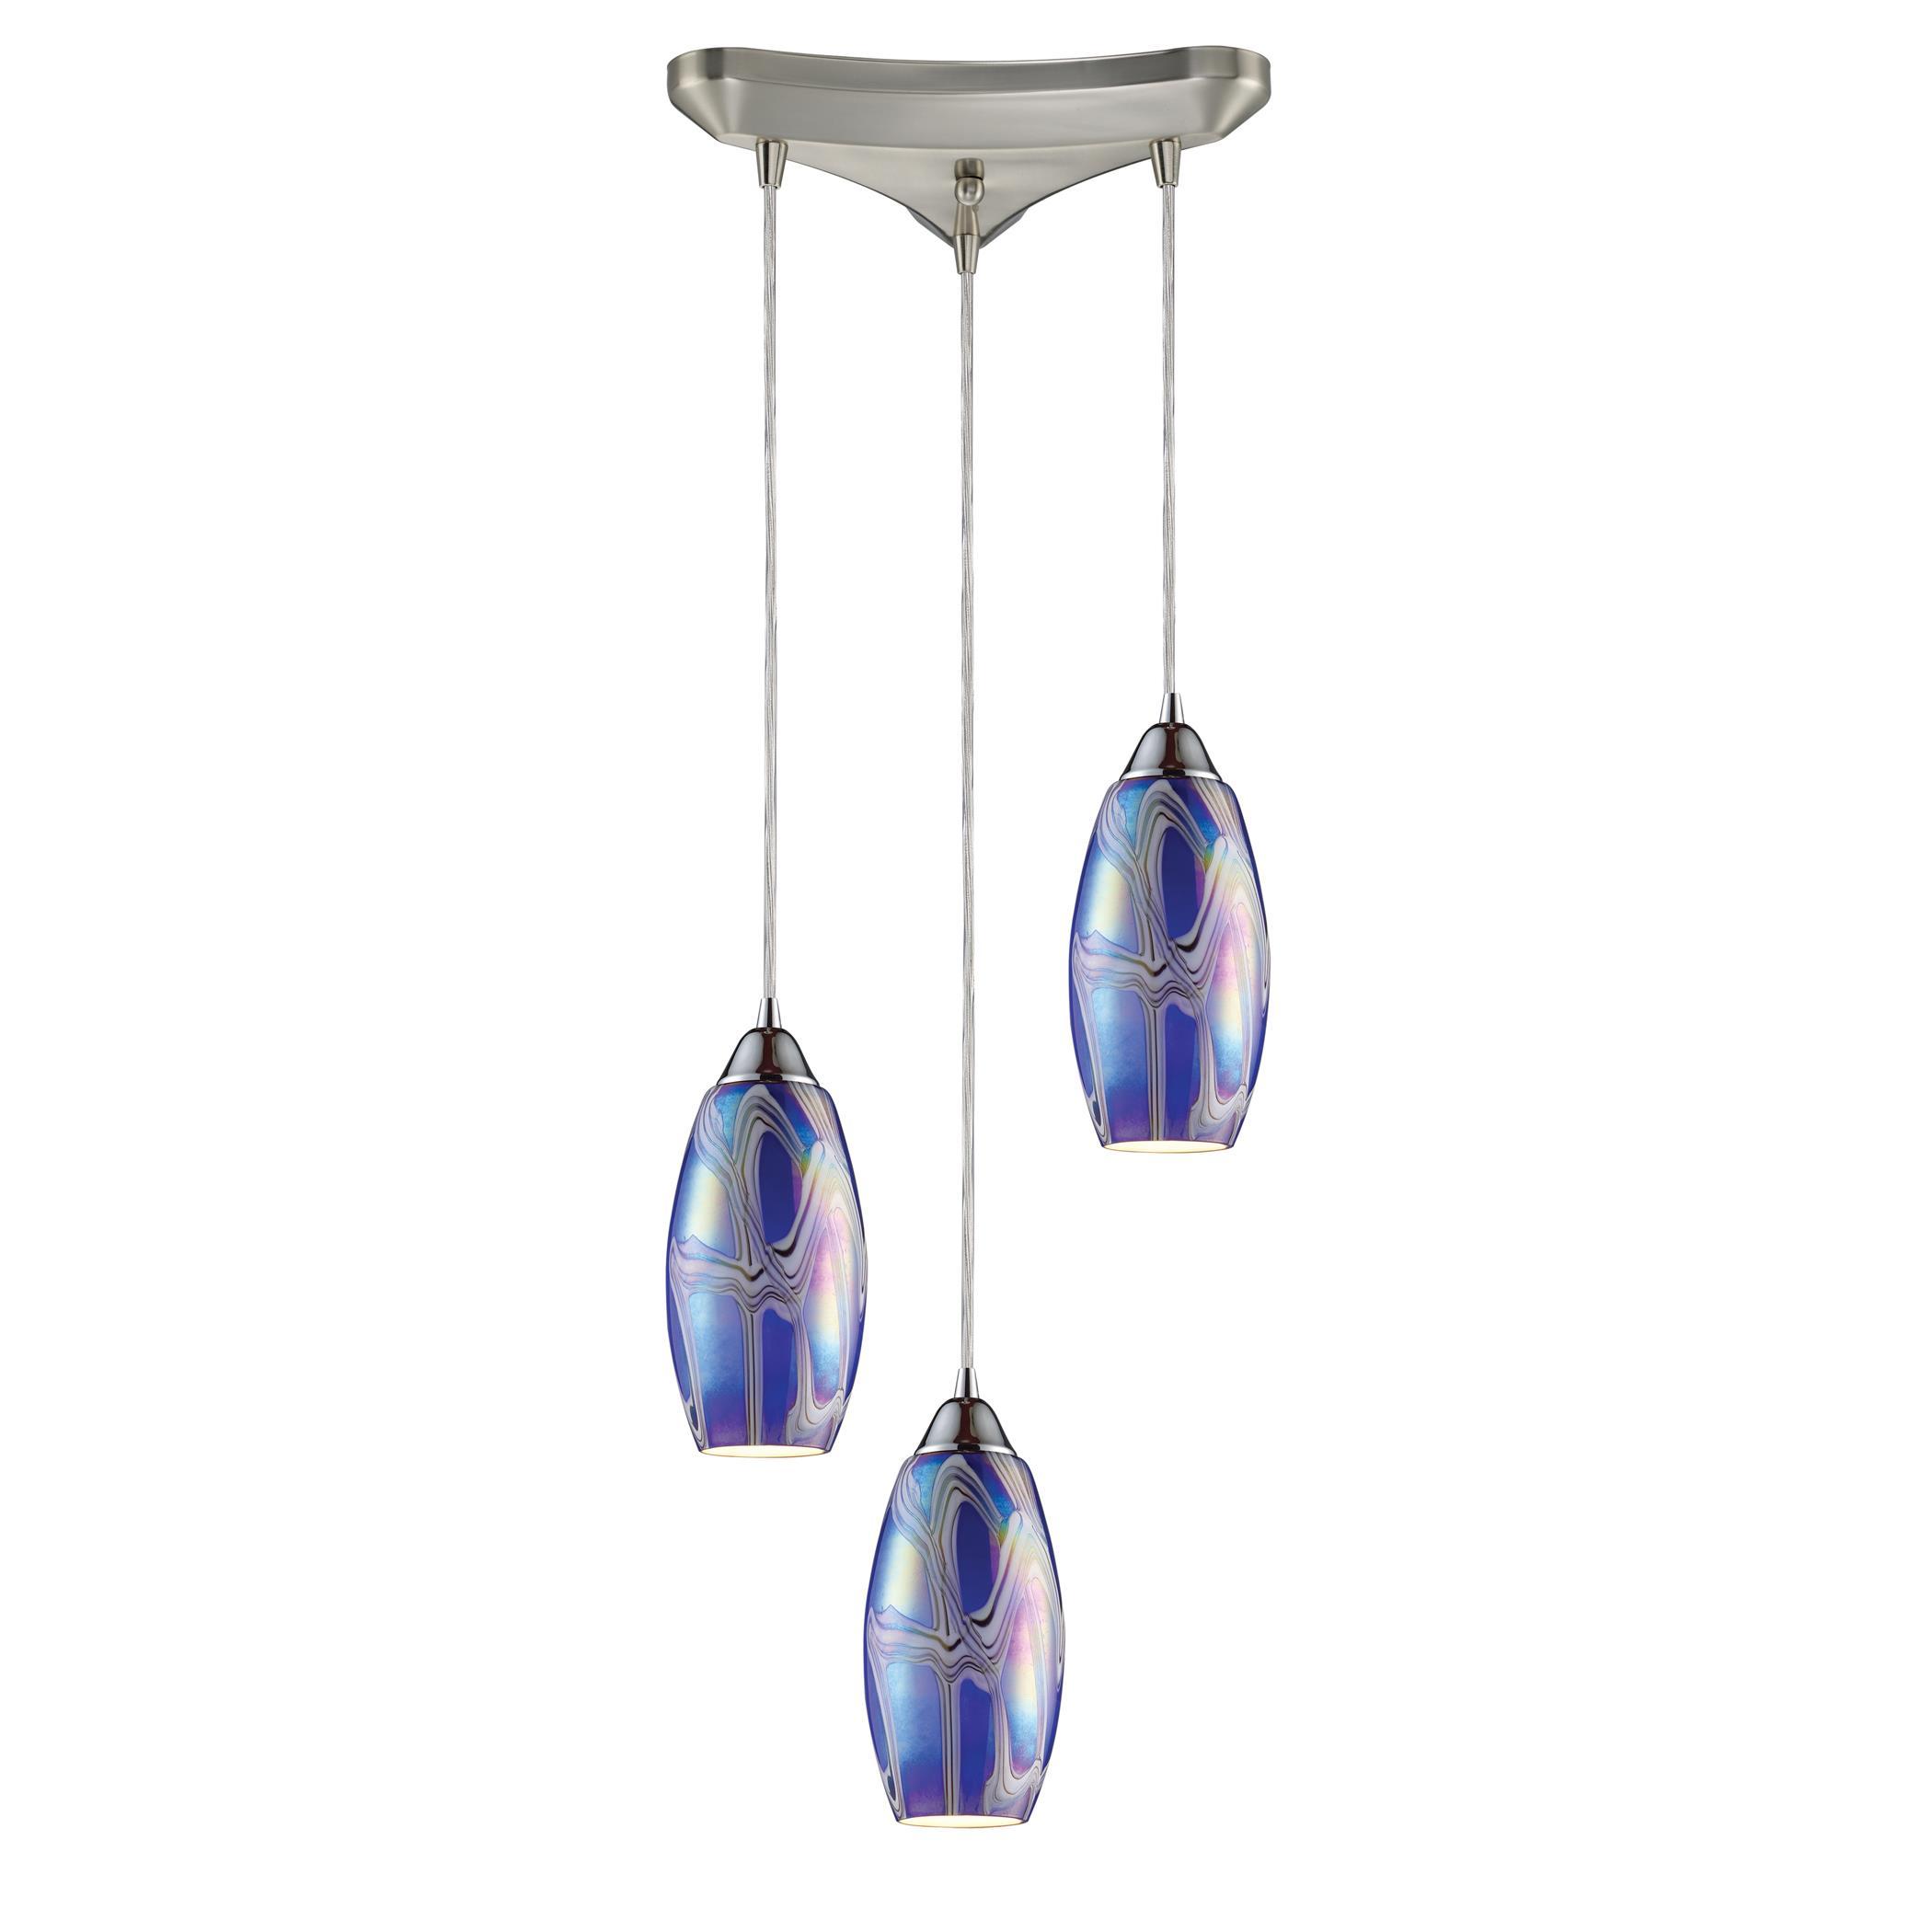 Storm Blue Iridescent Pendant Lights - Elk Lighting